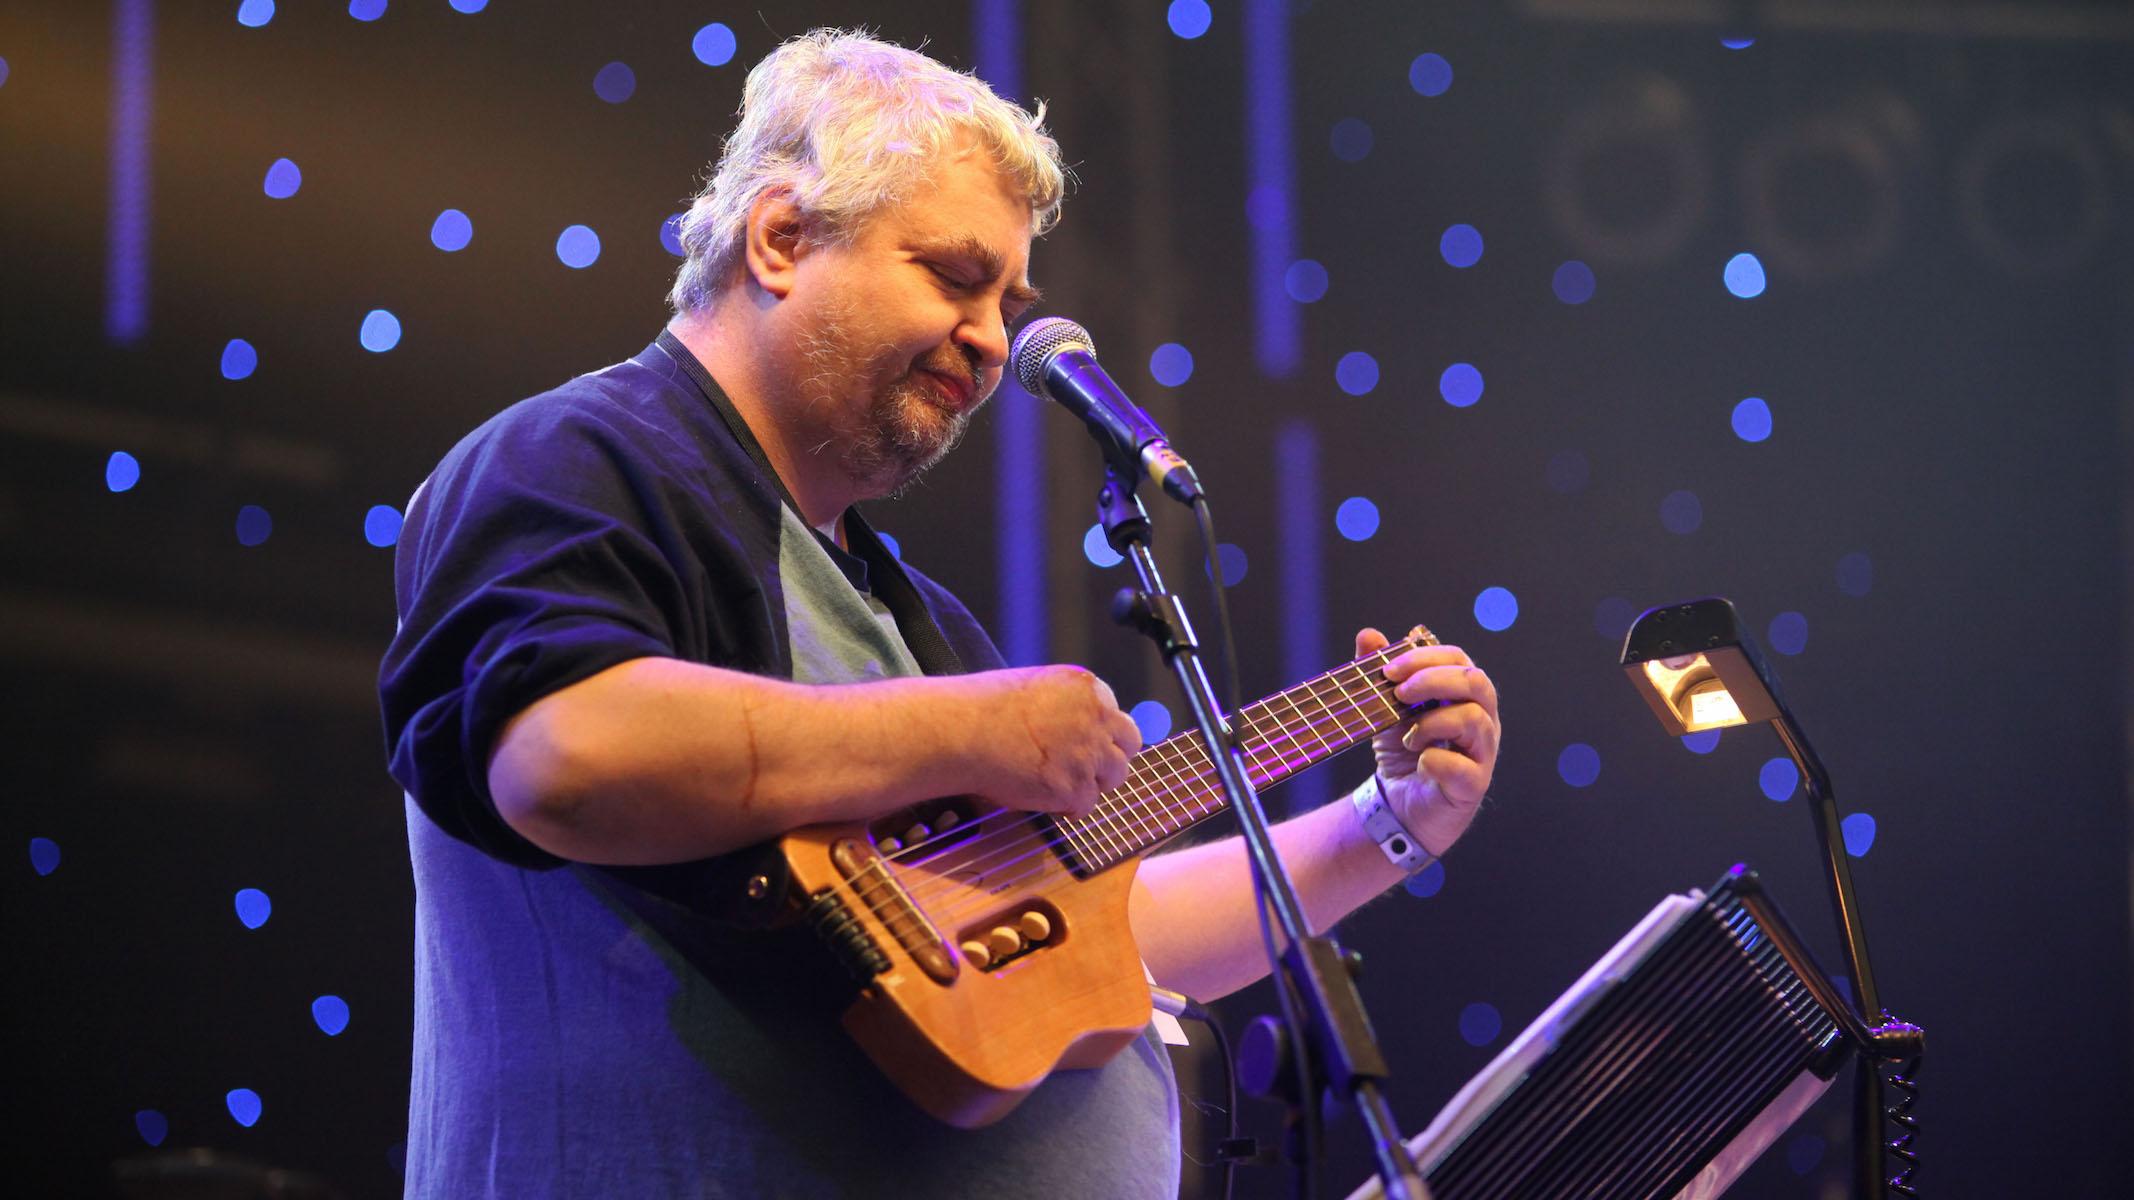 Beloved Singer/Songwriter Daniel Johnston Dead at 58